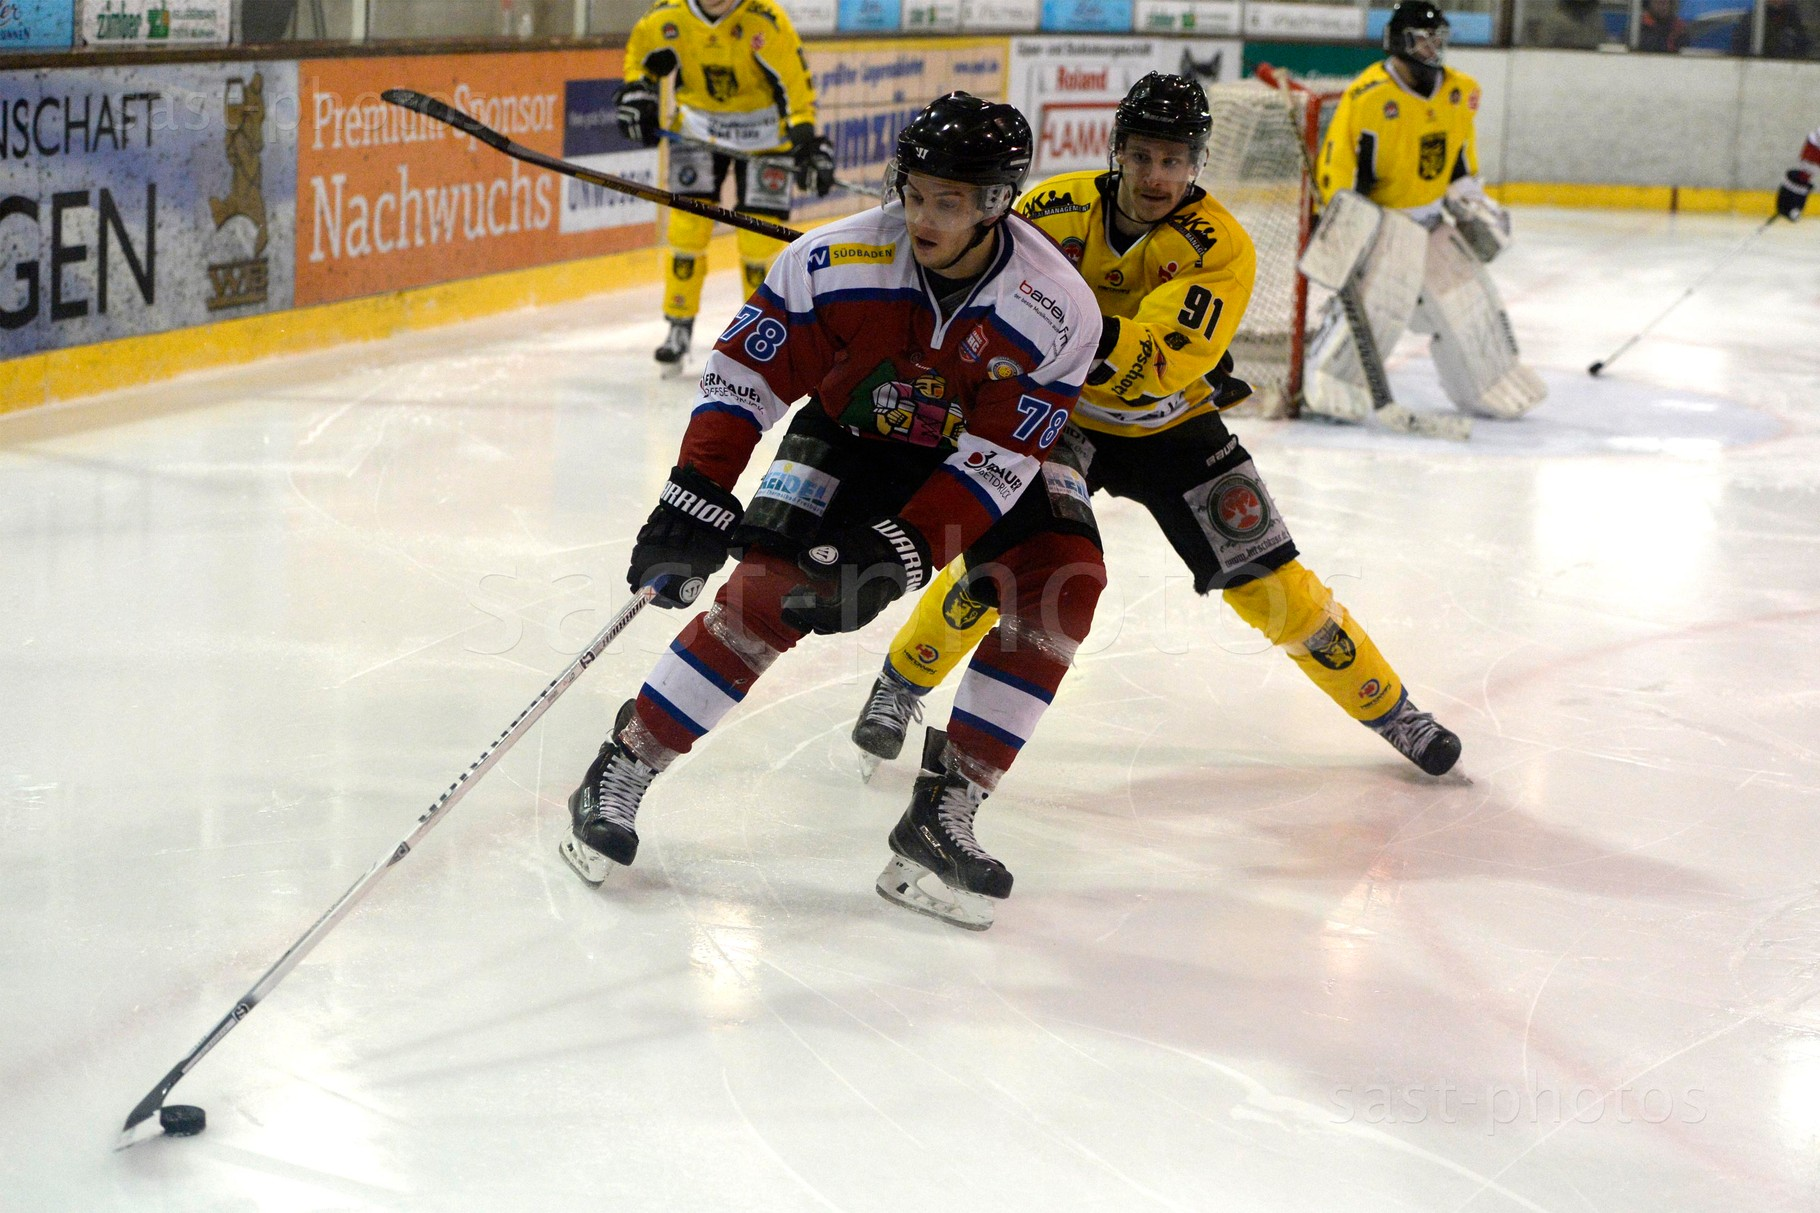 Enrico Saccomani (L. Freiburg) gegen Dominik Walleitner (Bad Toelz)